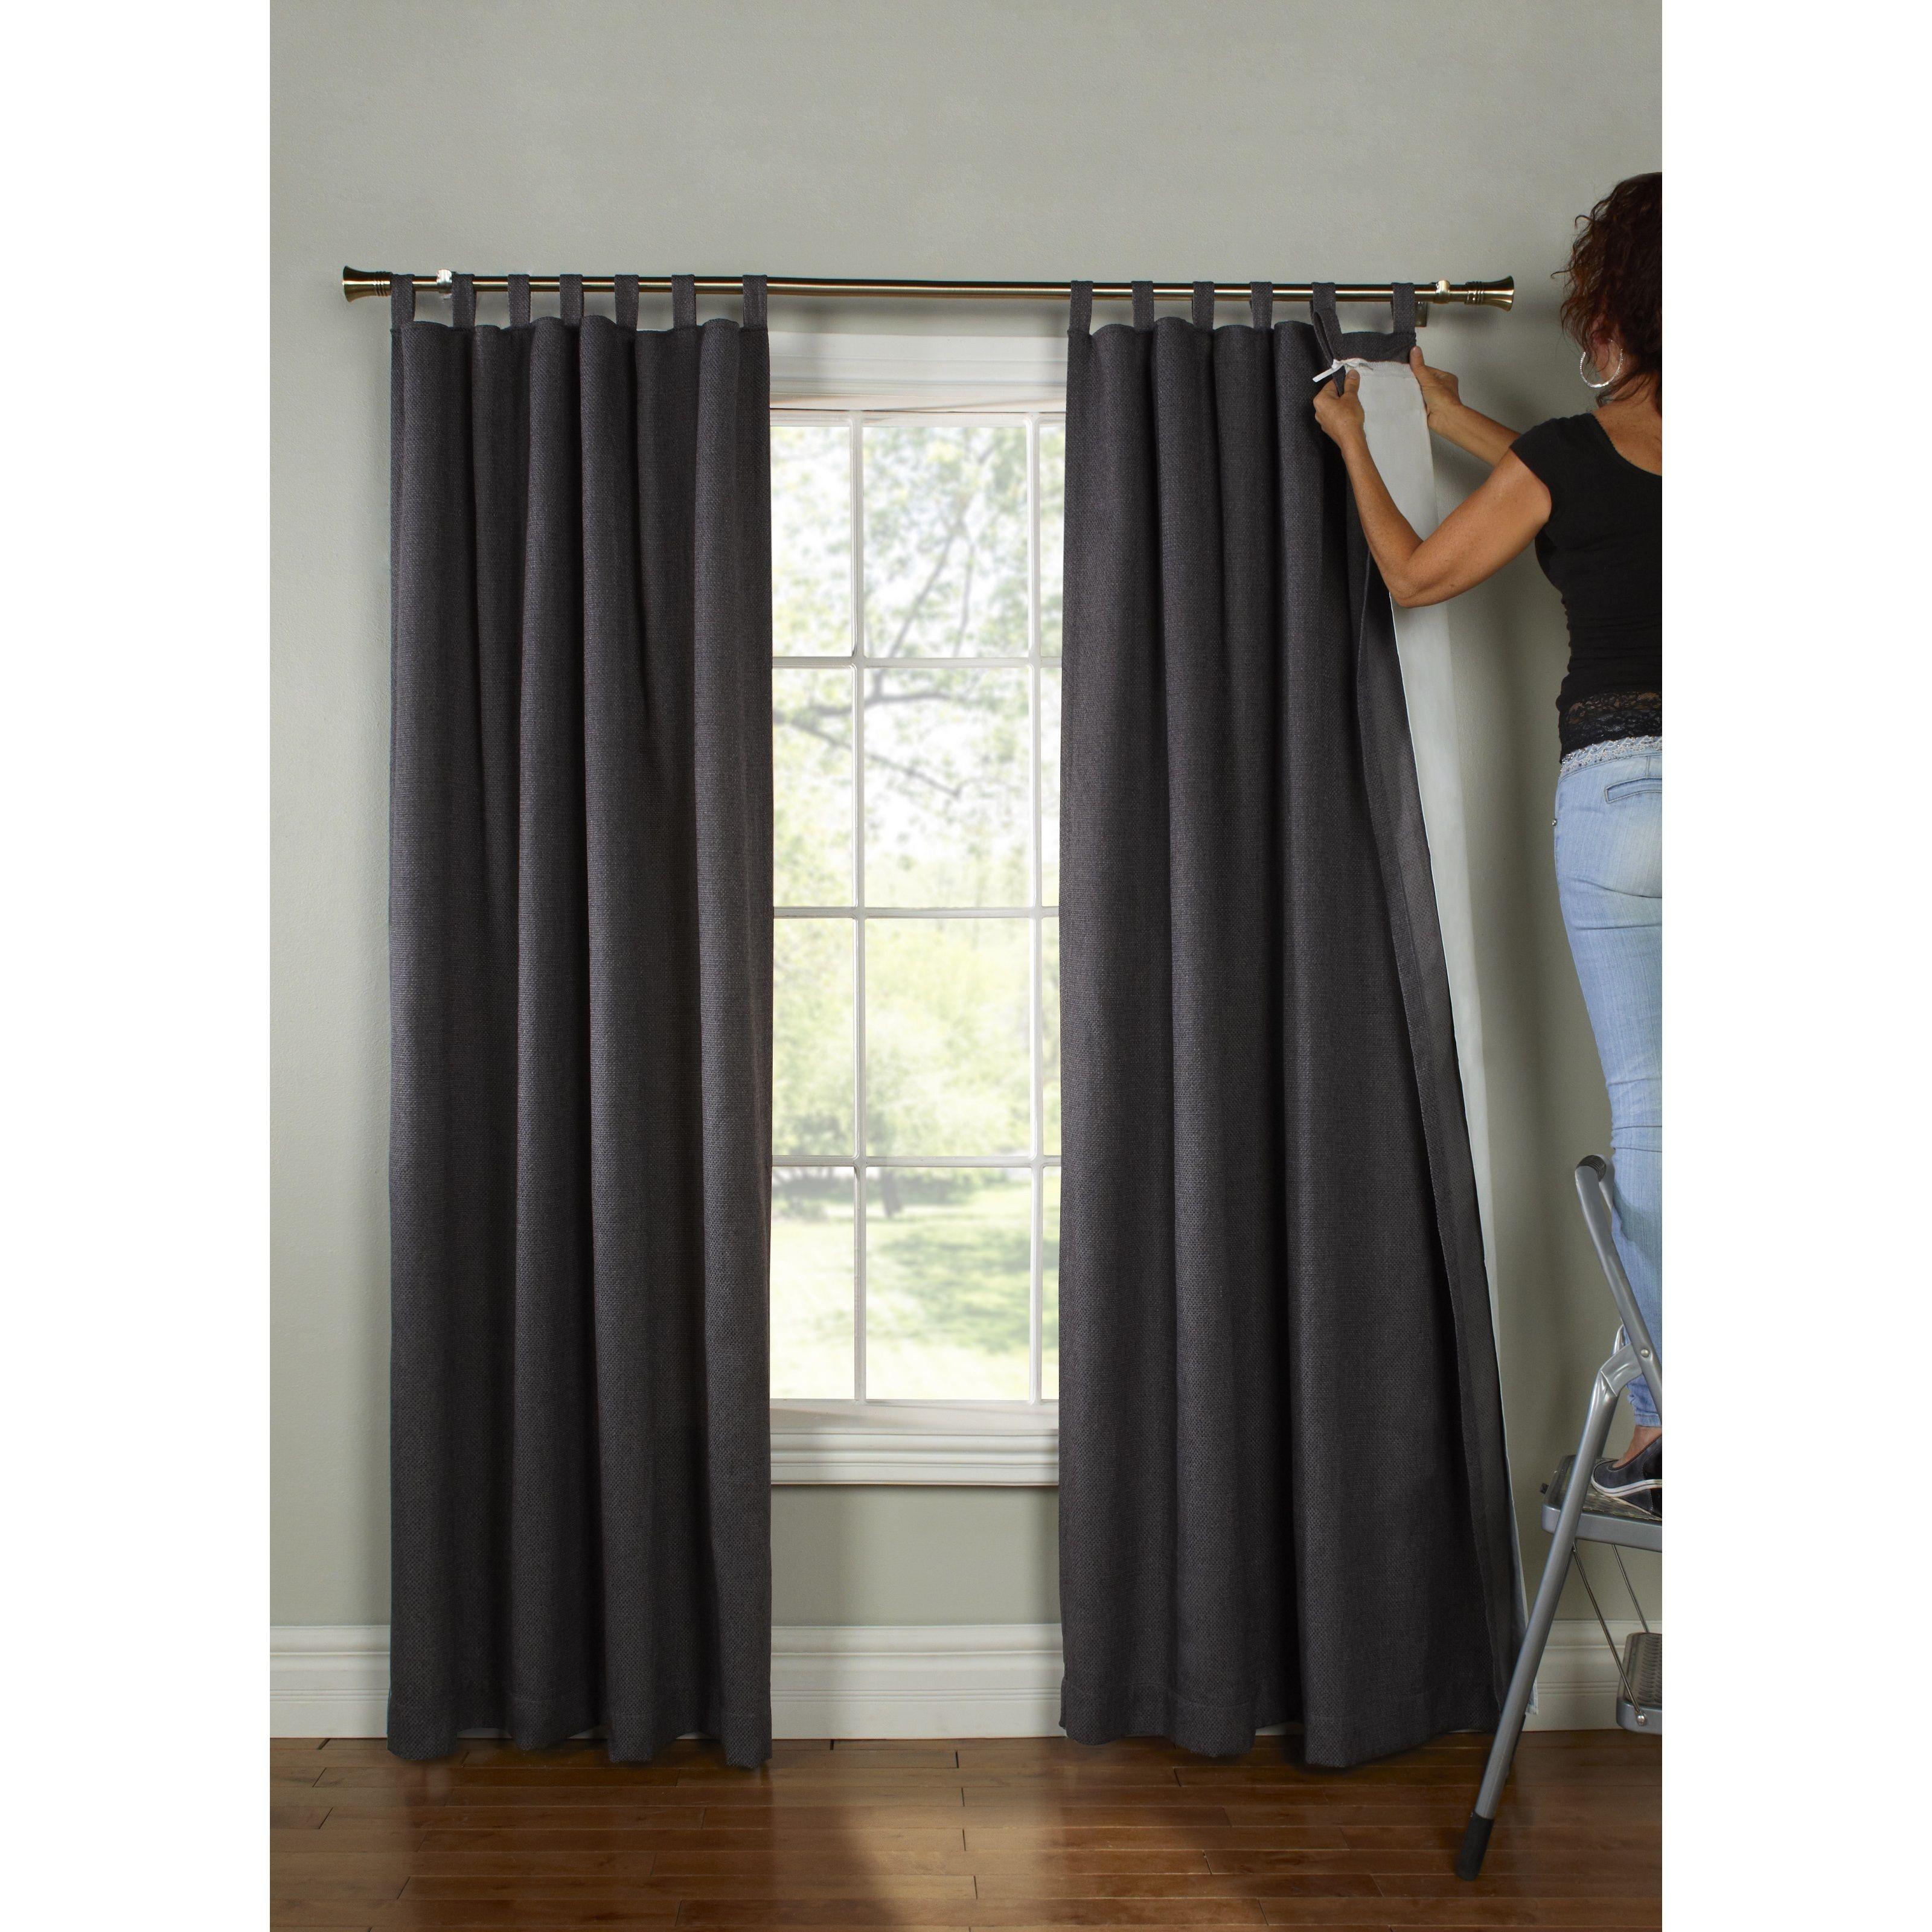 bathroom inch curtain window hookless escape reg panels bed bath curtains